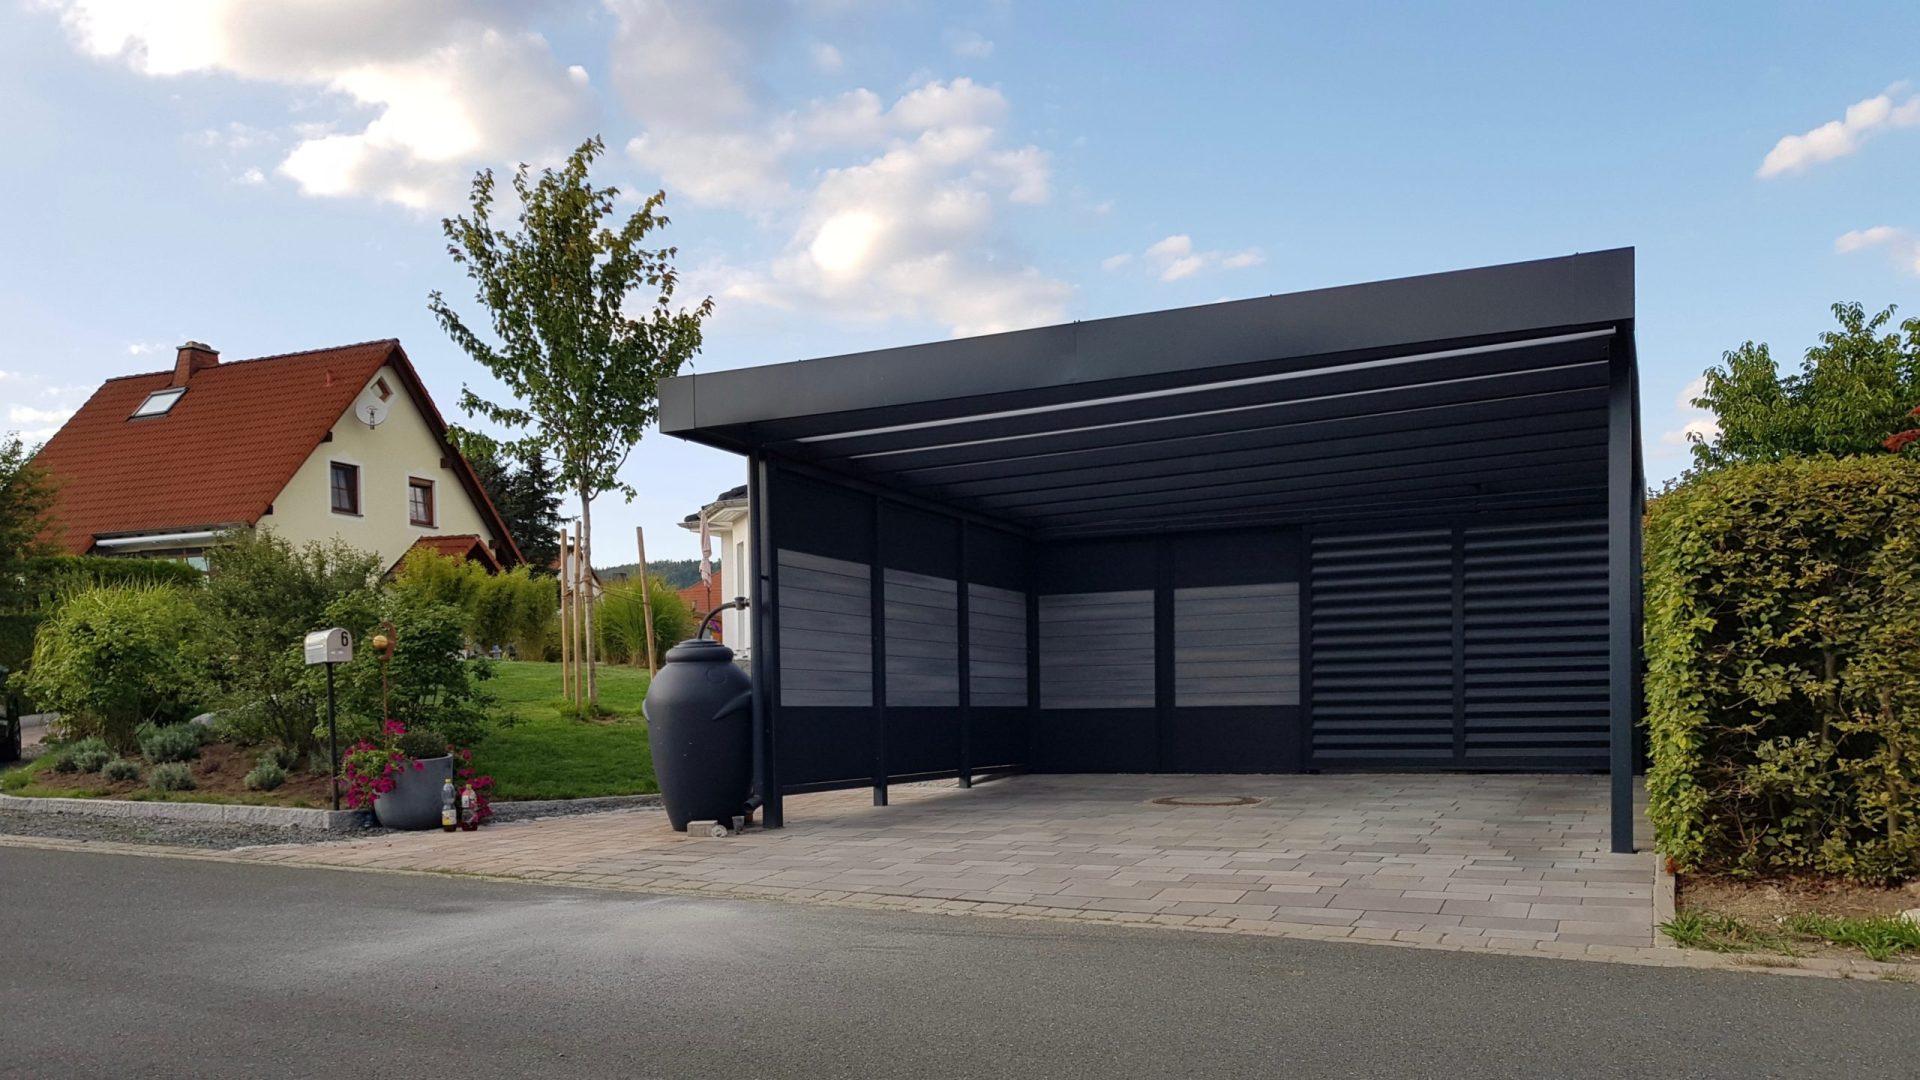 Doppelcarport mit Schuppen - Carportmaster Projekt 15-P-1247 - 95365 Rugendorf - Carportbild 02